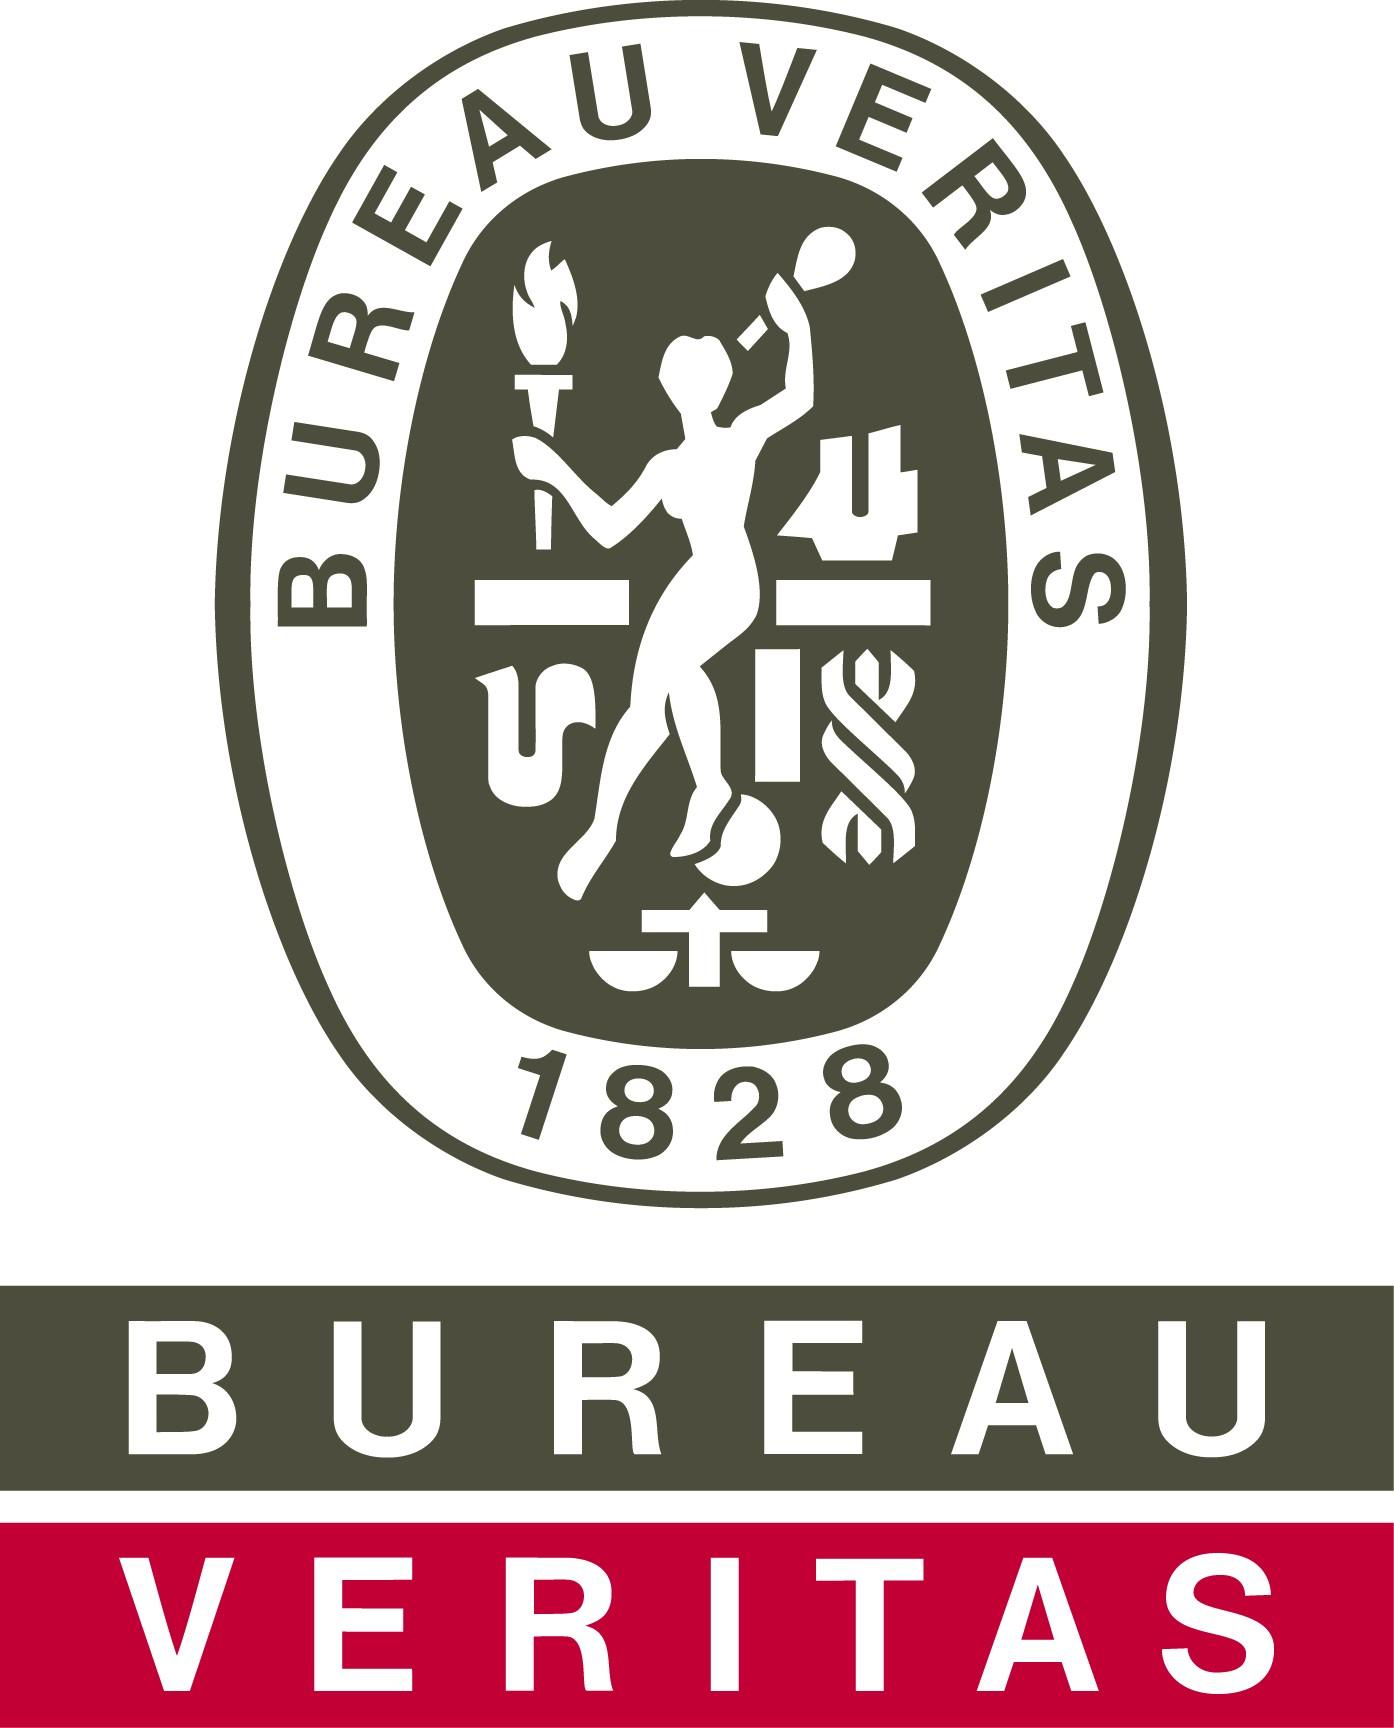 Bureau-Veritas.jpg